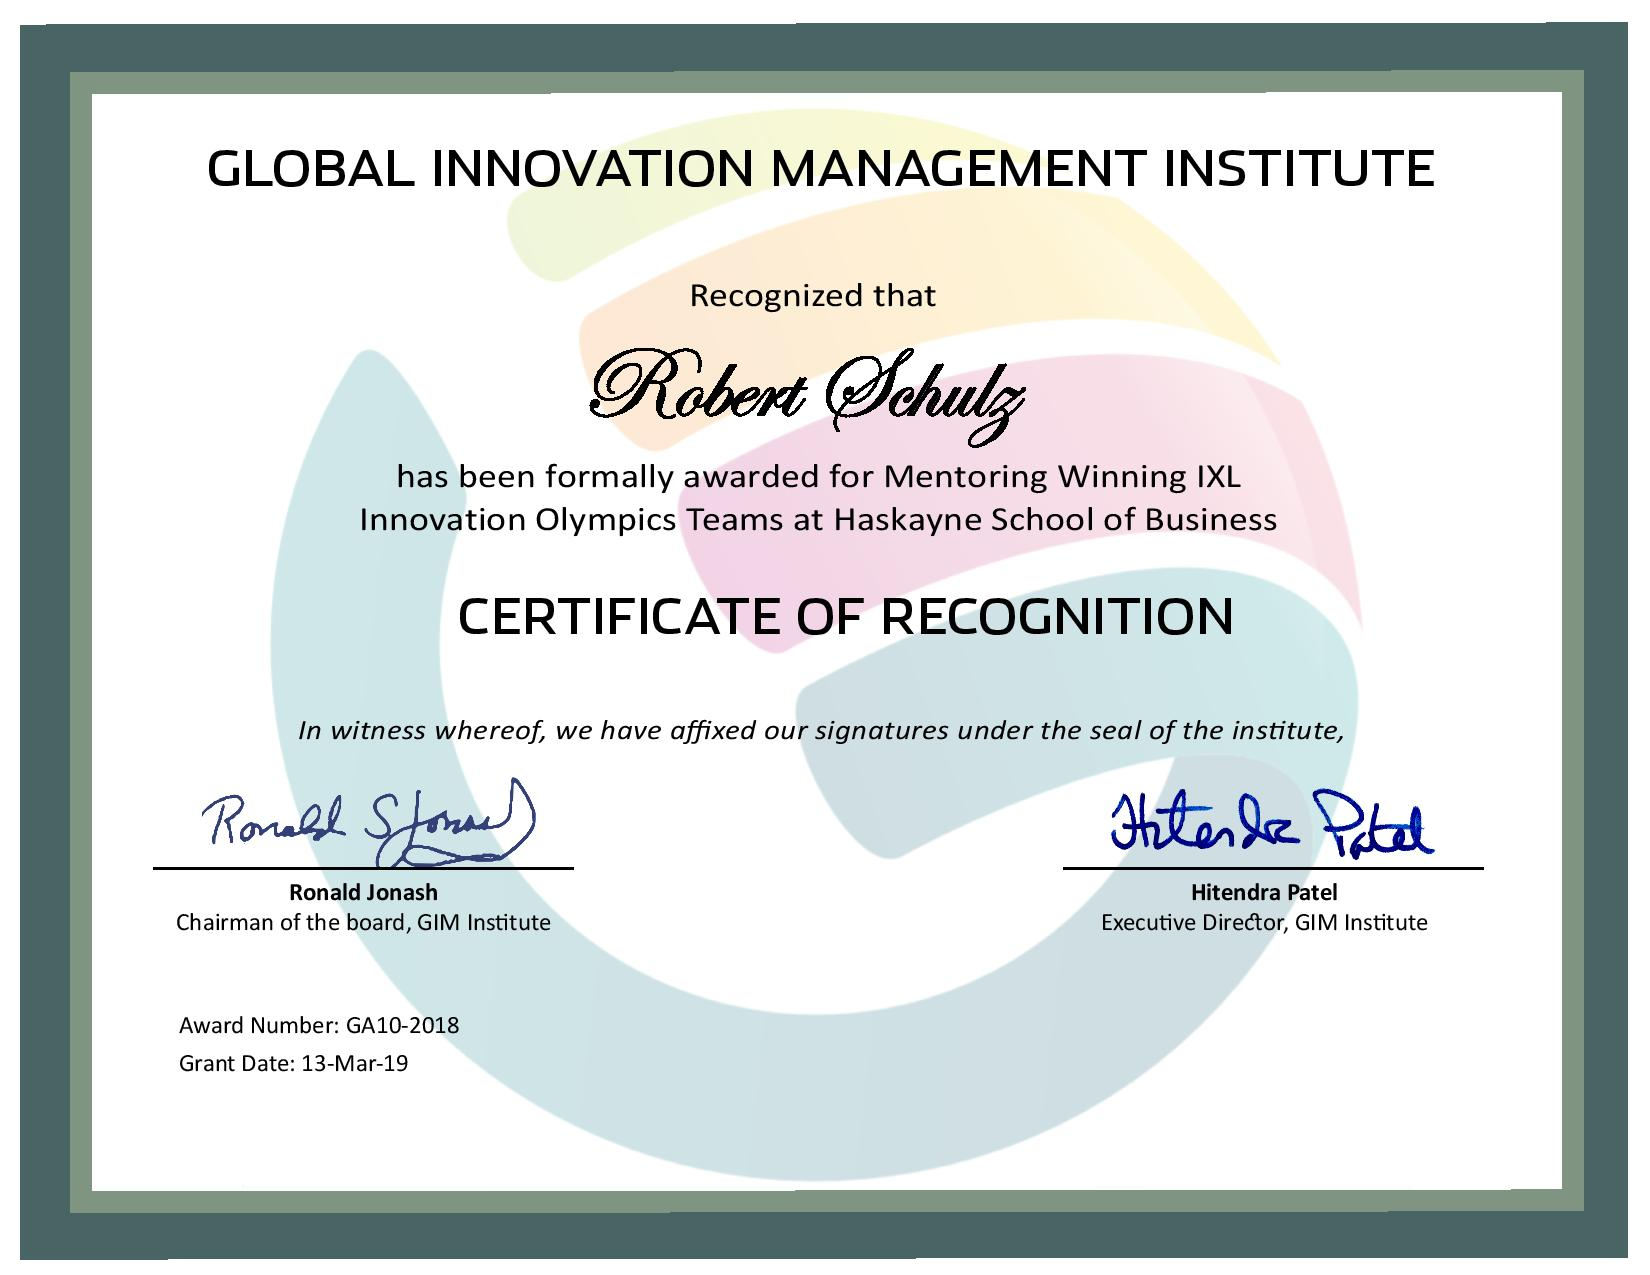 for for Mentoring Winning IXL Innovation Olympics Teams at Haskayne School of Business